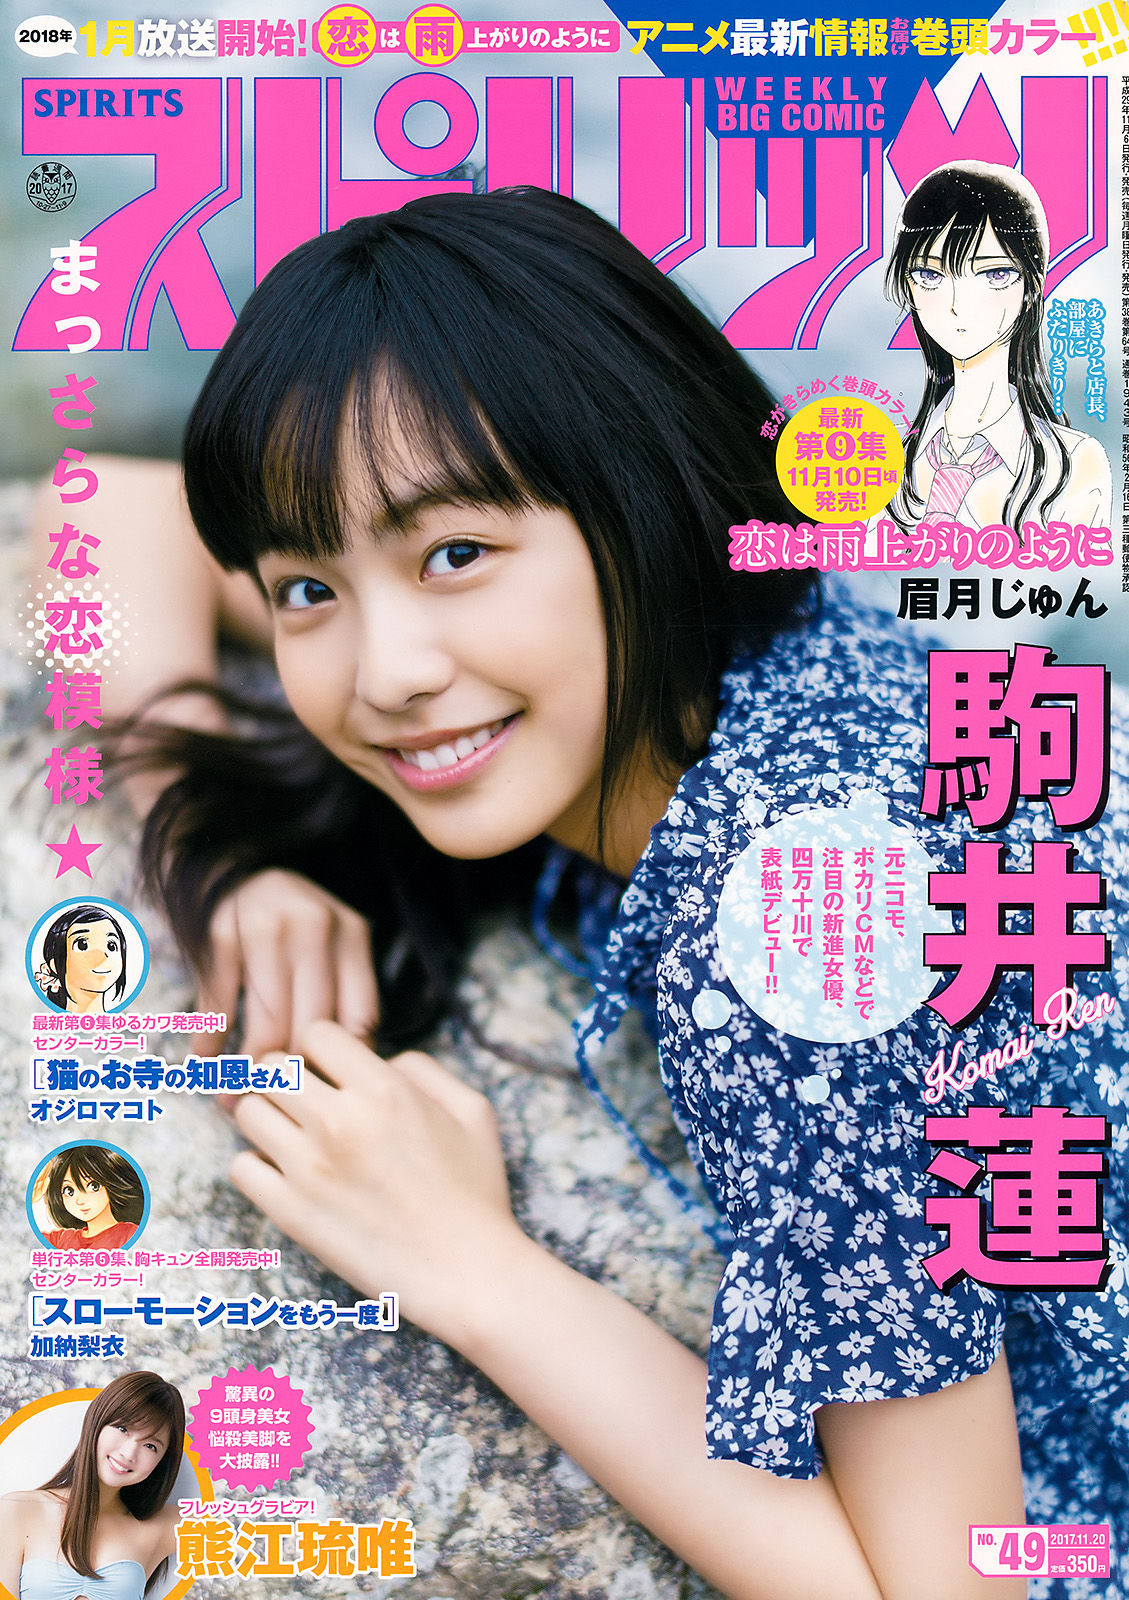 Komai Ren 駒井蓮, Big Comic Spirits 2017 No.49 (週刊スピリッツ 2017年49号)